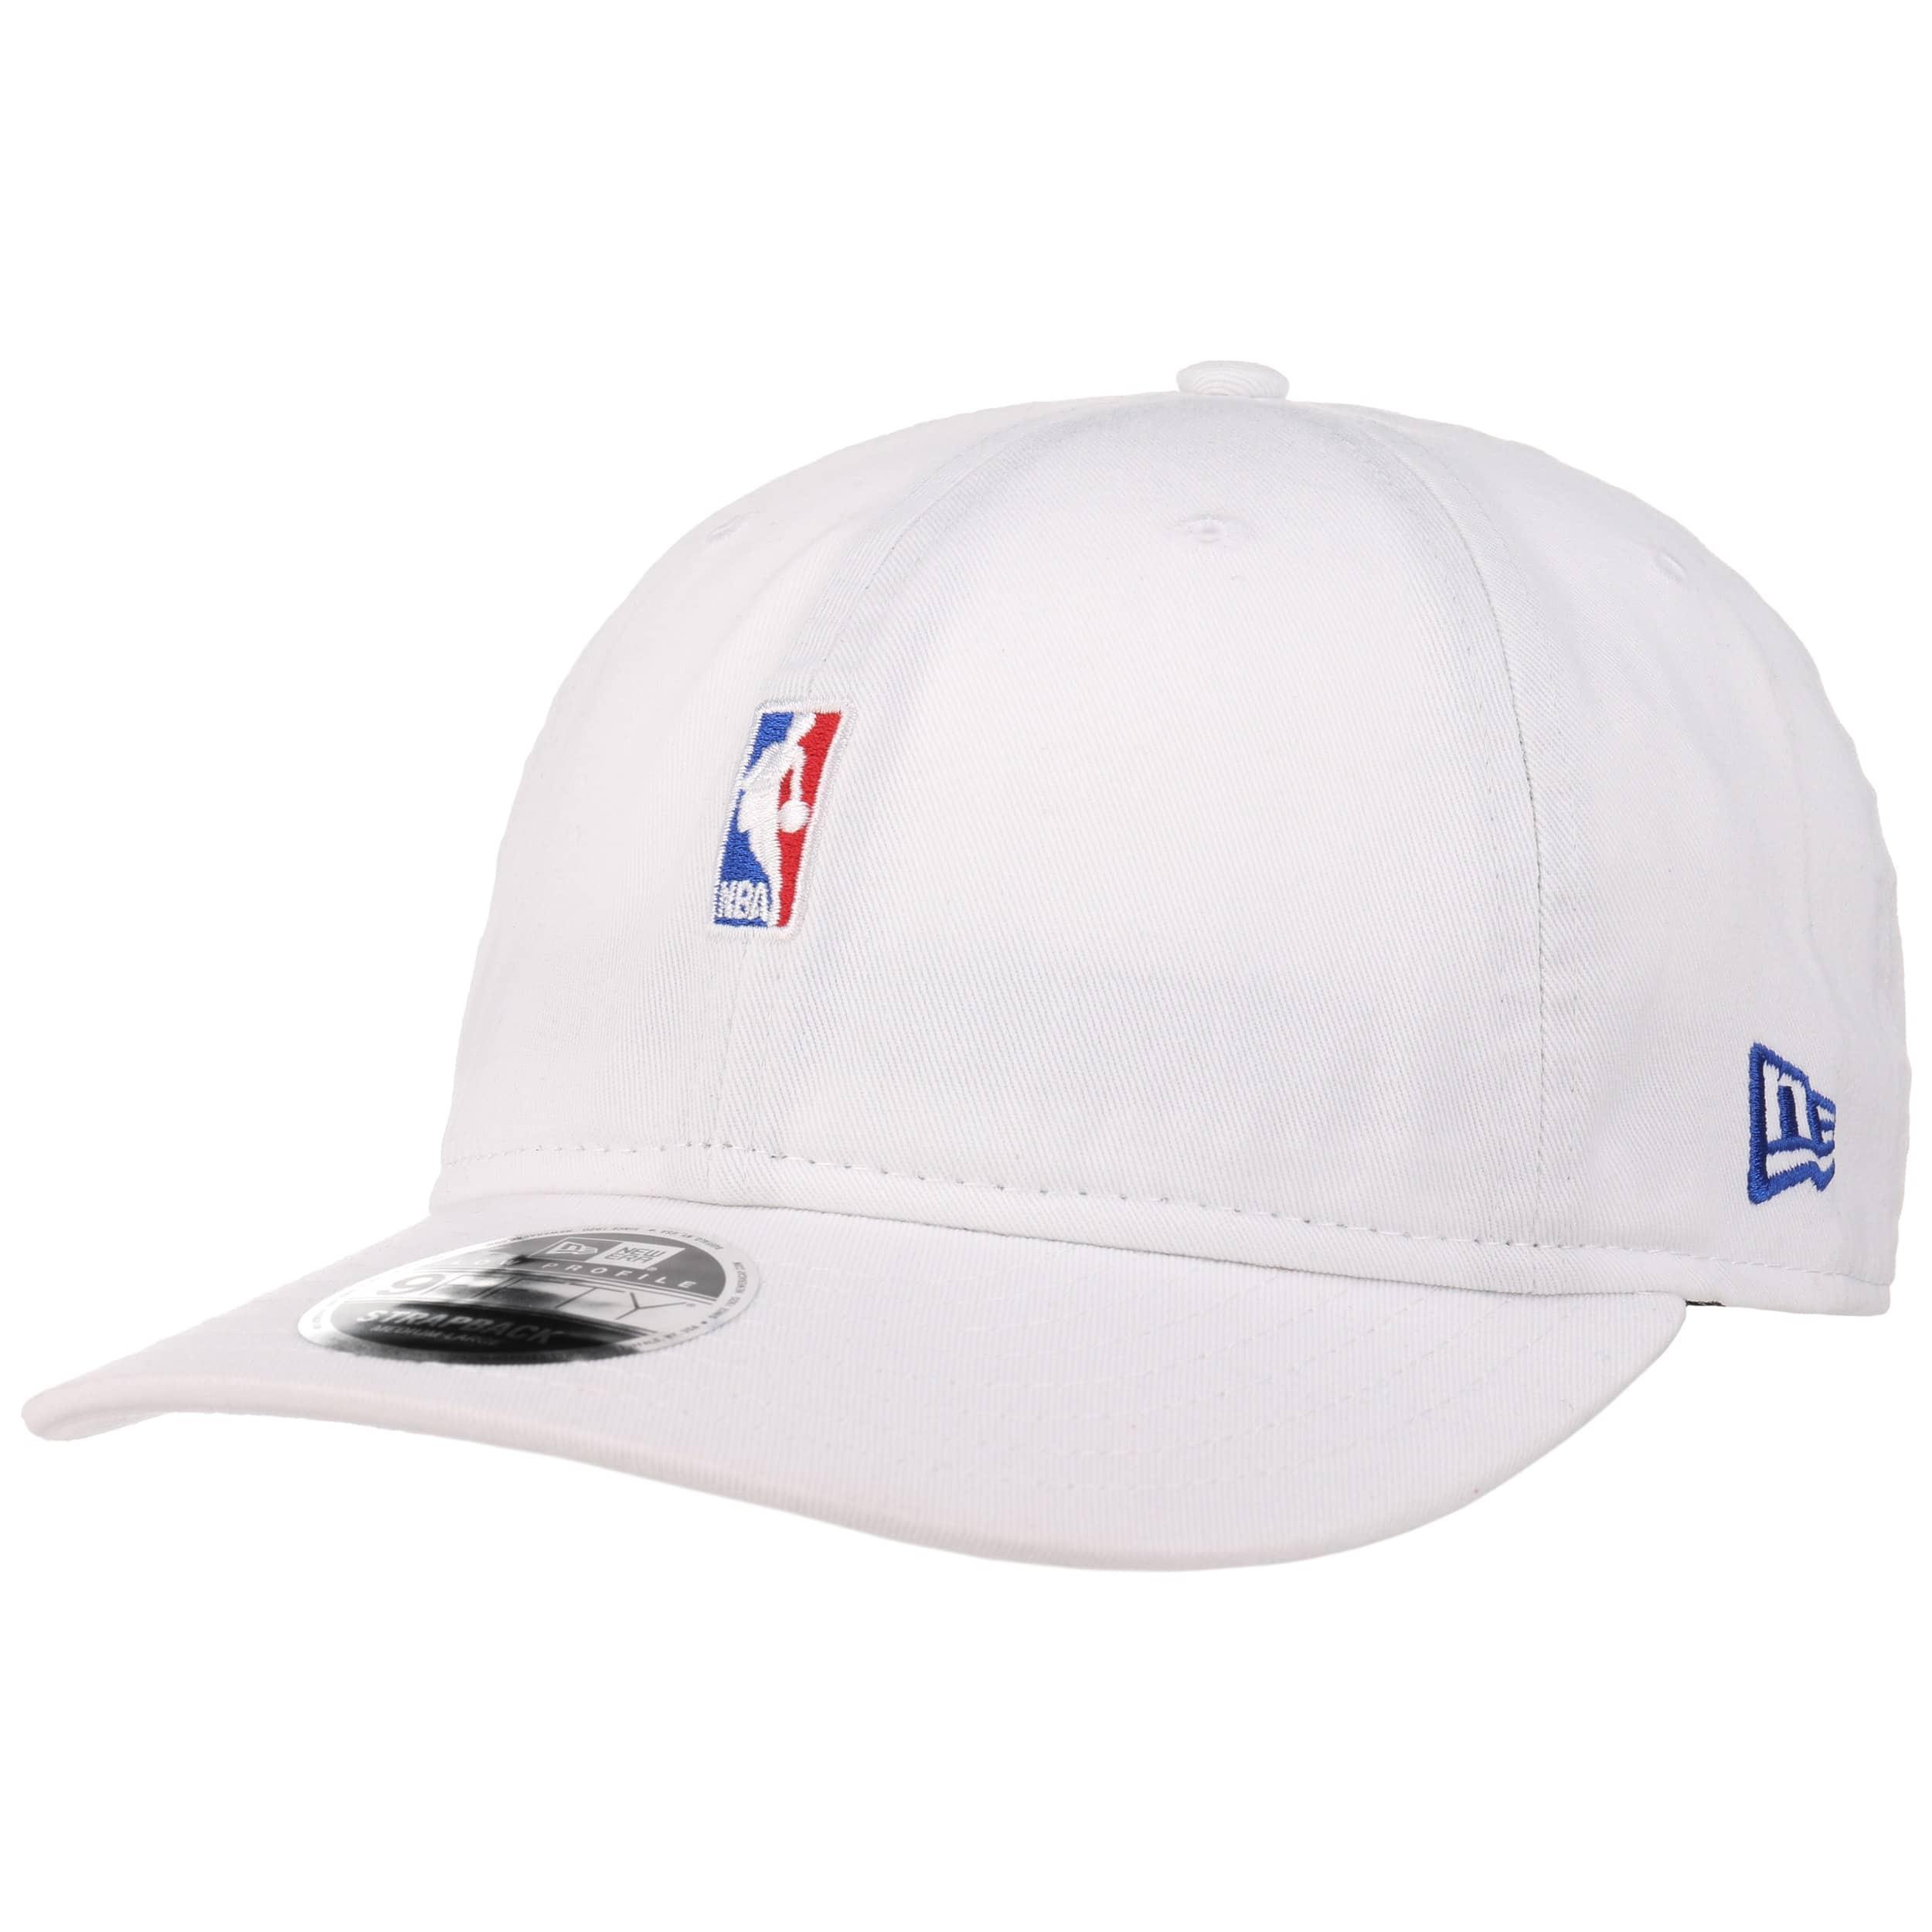 53ef4c0c2392ef ... 9Fifty Low Crown NBA Logo Cap by New Era - royal-blue 6